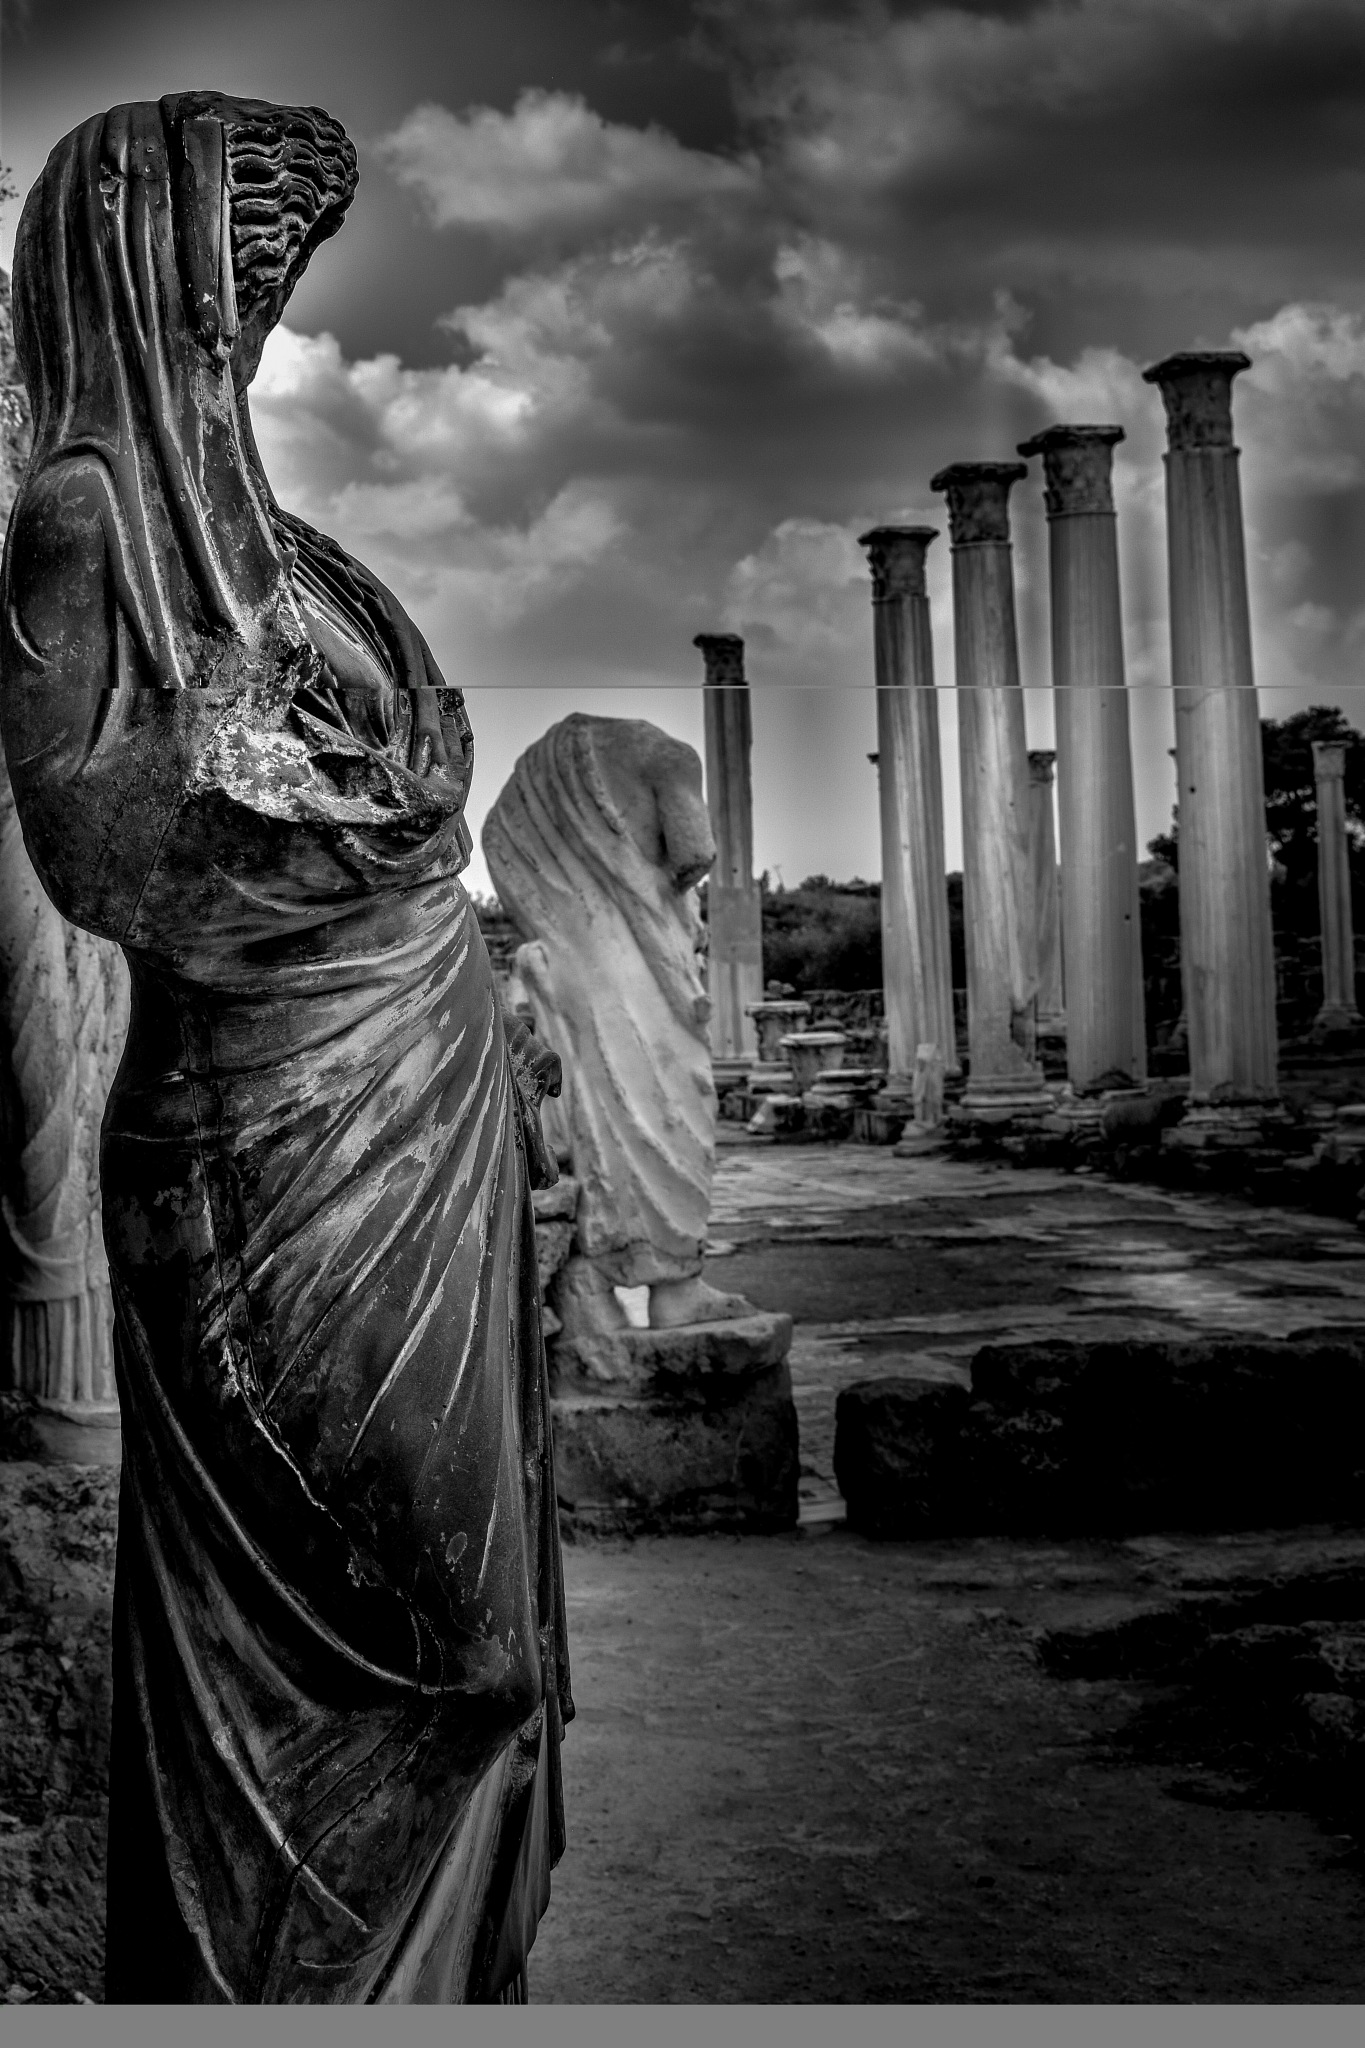 Roman ruins by Stephen Baker